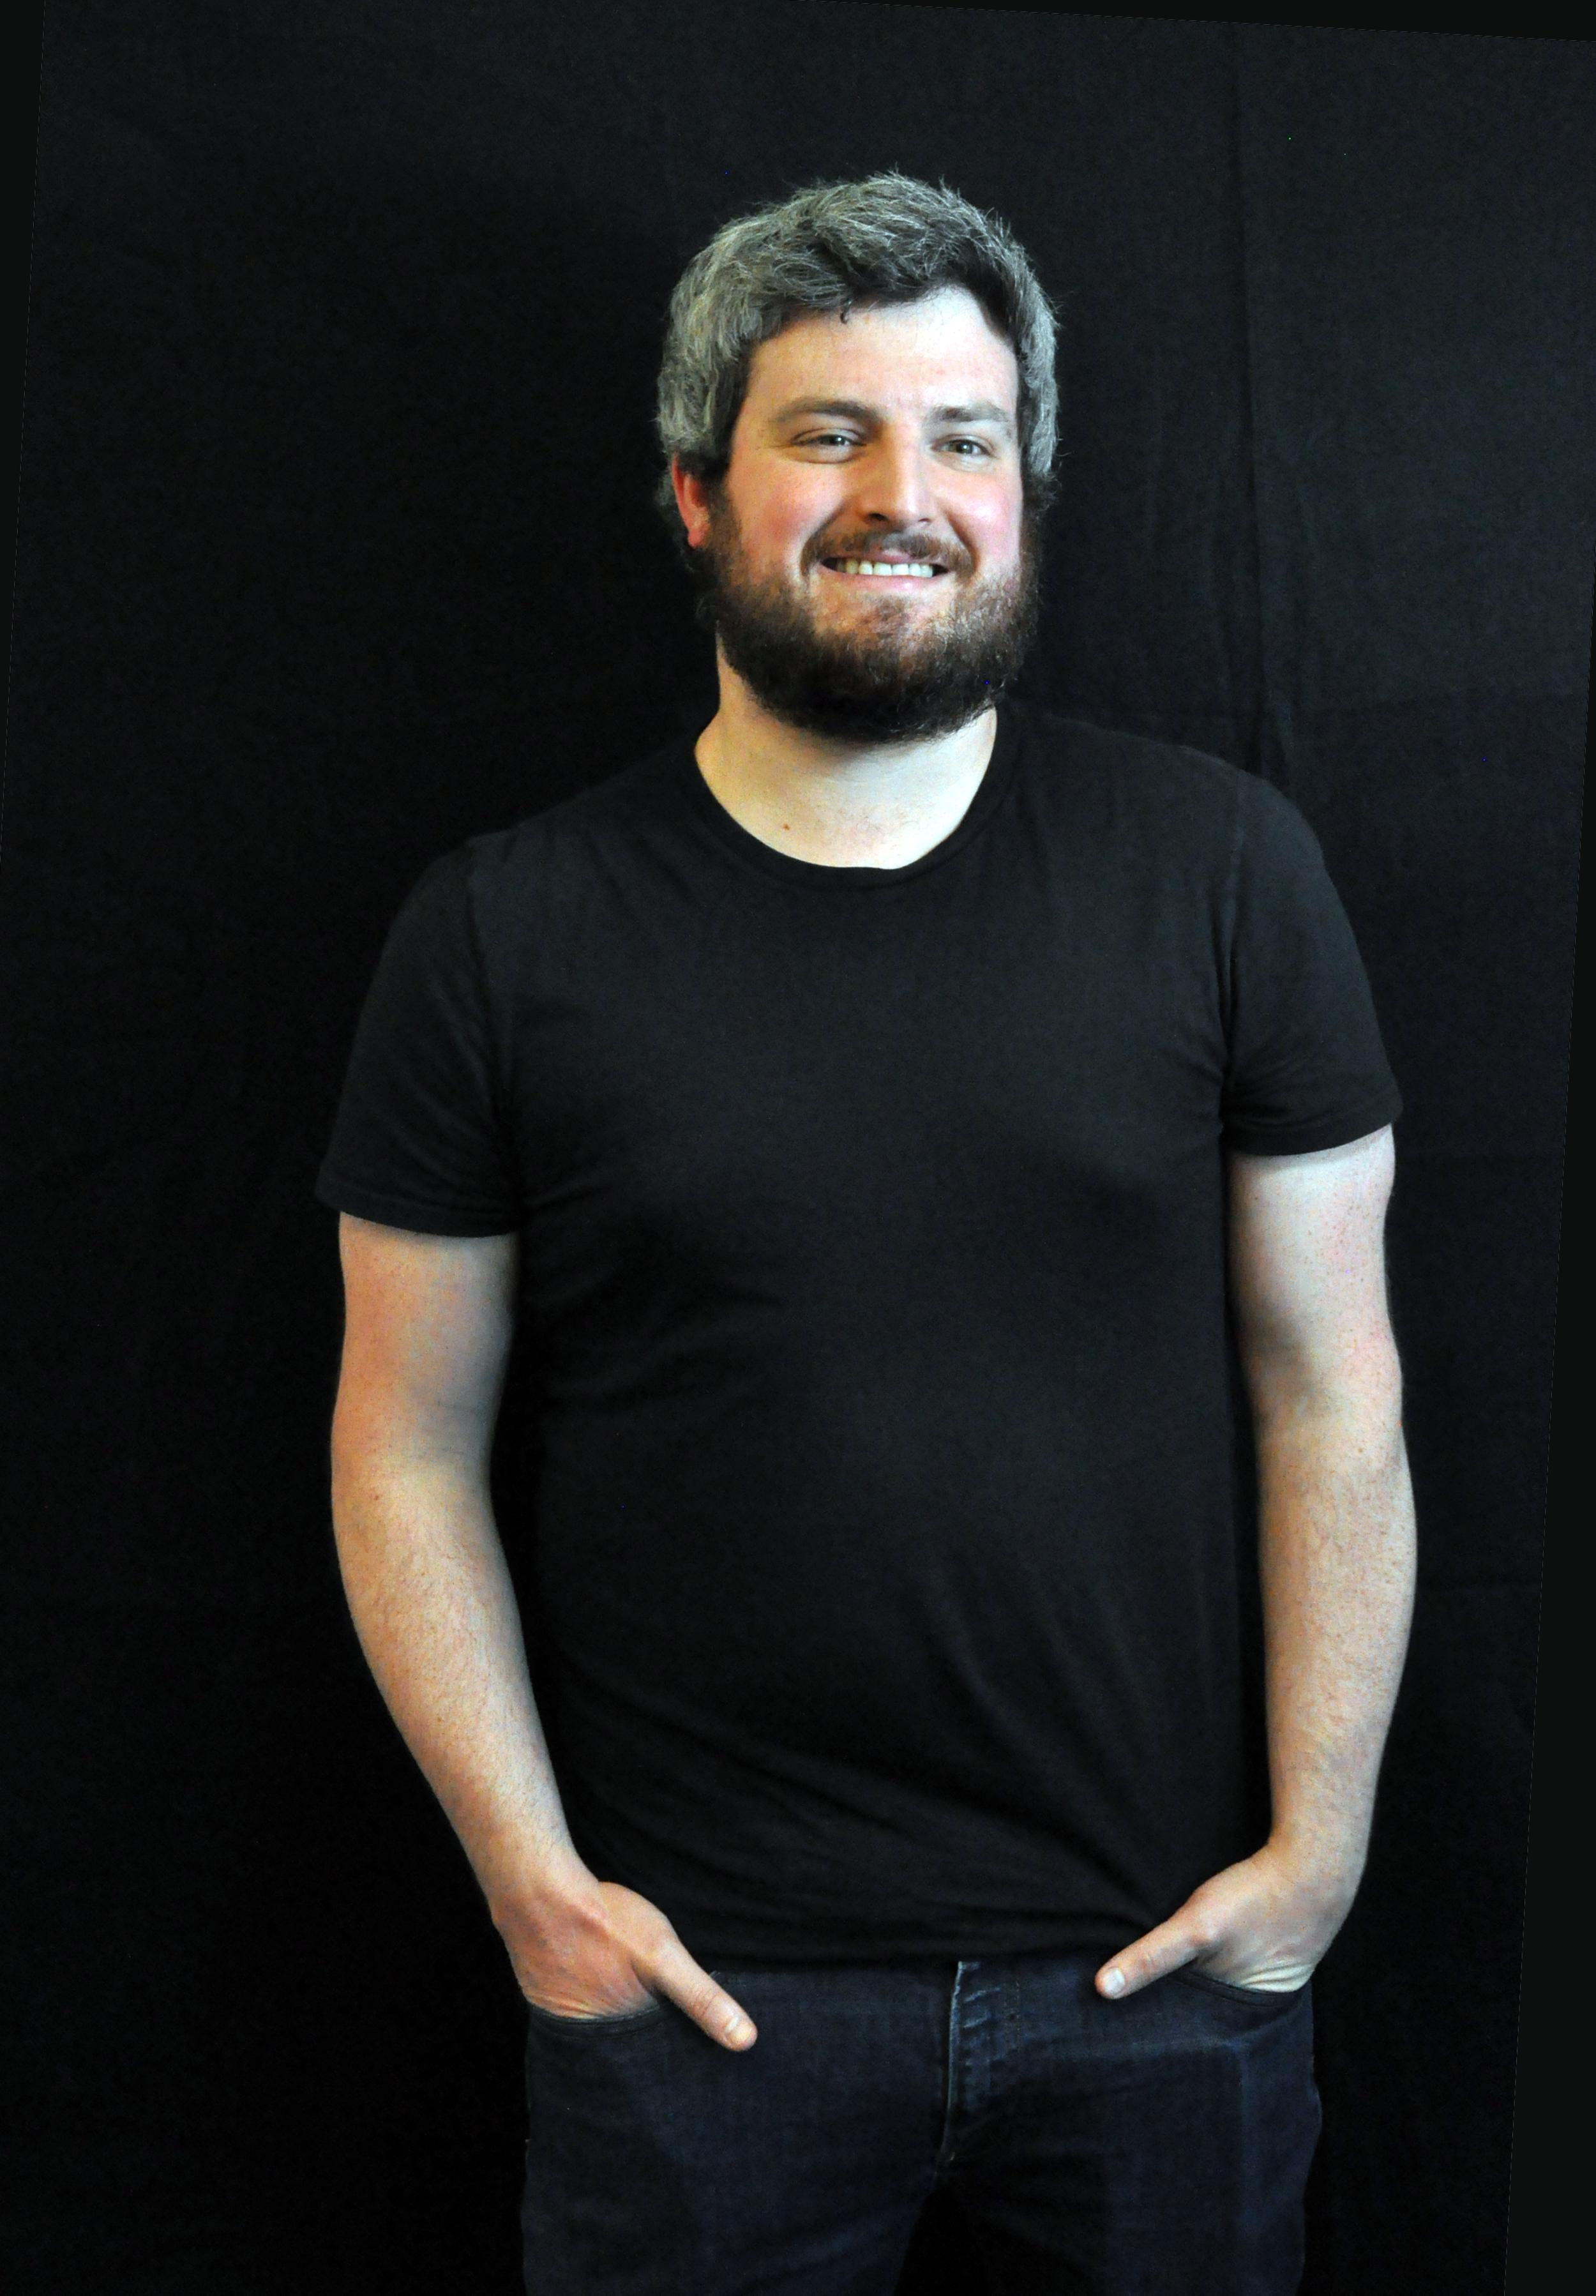 Michael Boucher - michael.boucher[at]ucsf[dot]eduPostdoctoral FellowPh.D. Microbiology and ImmunologyStanford University